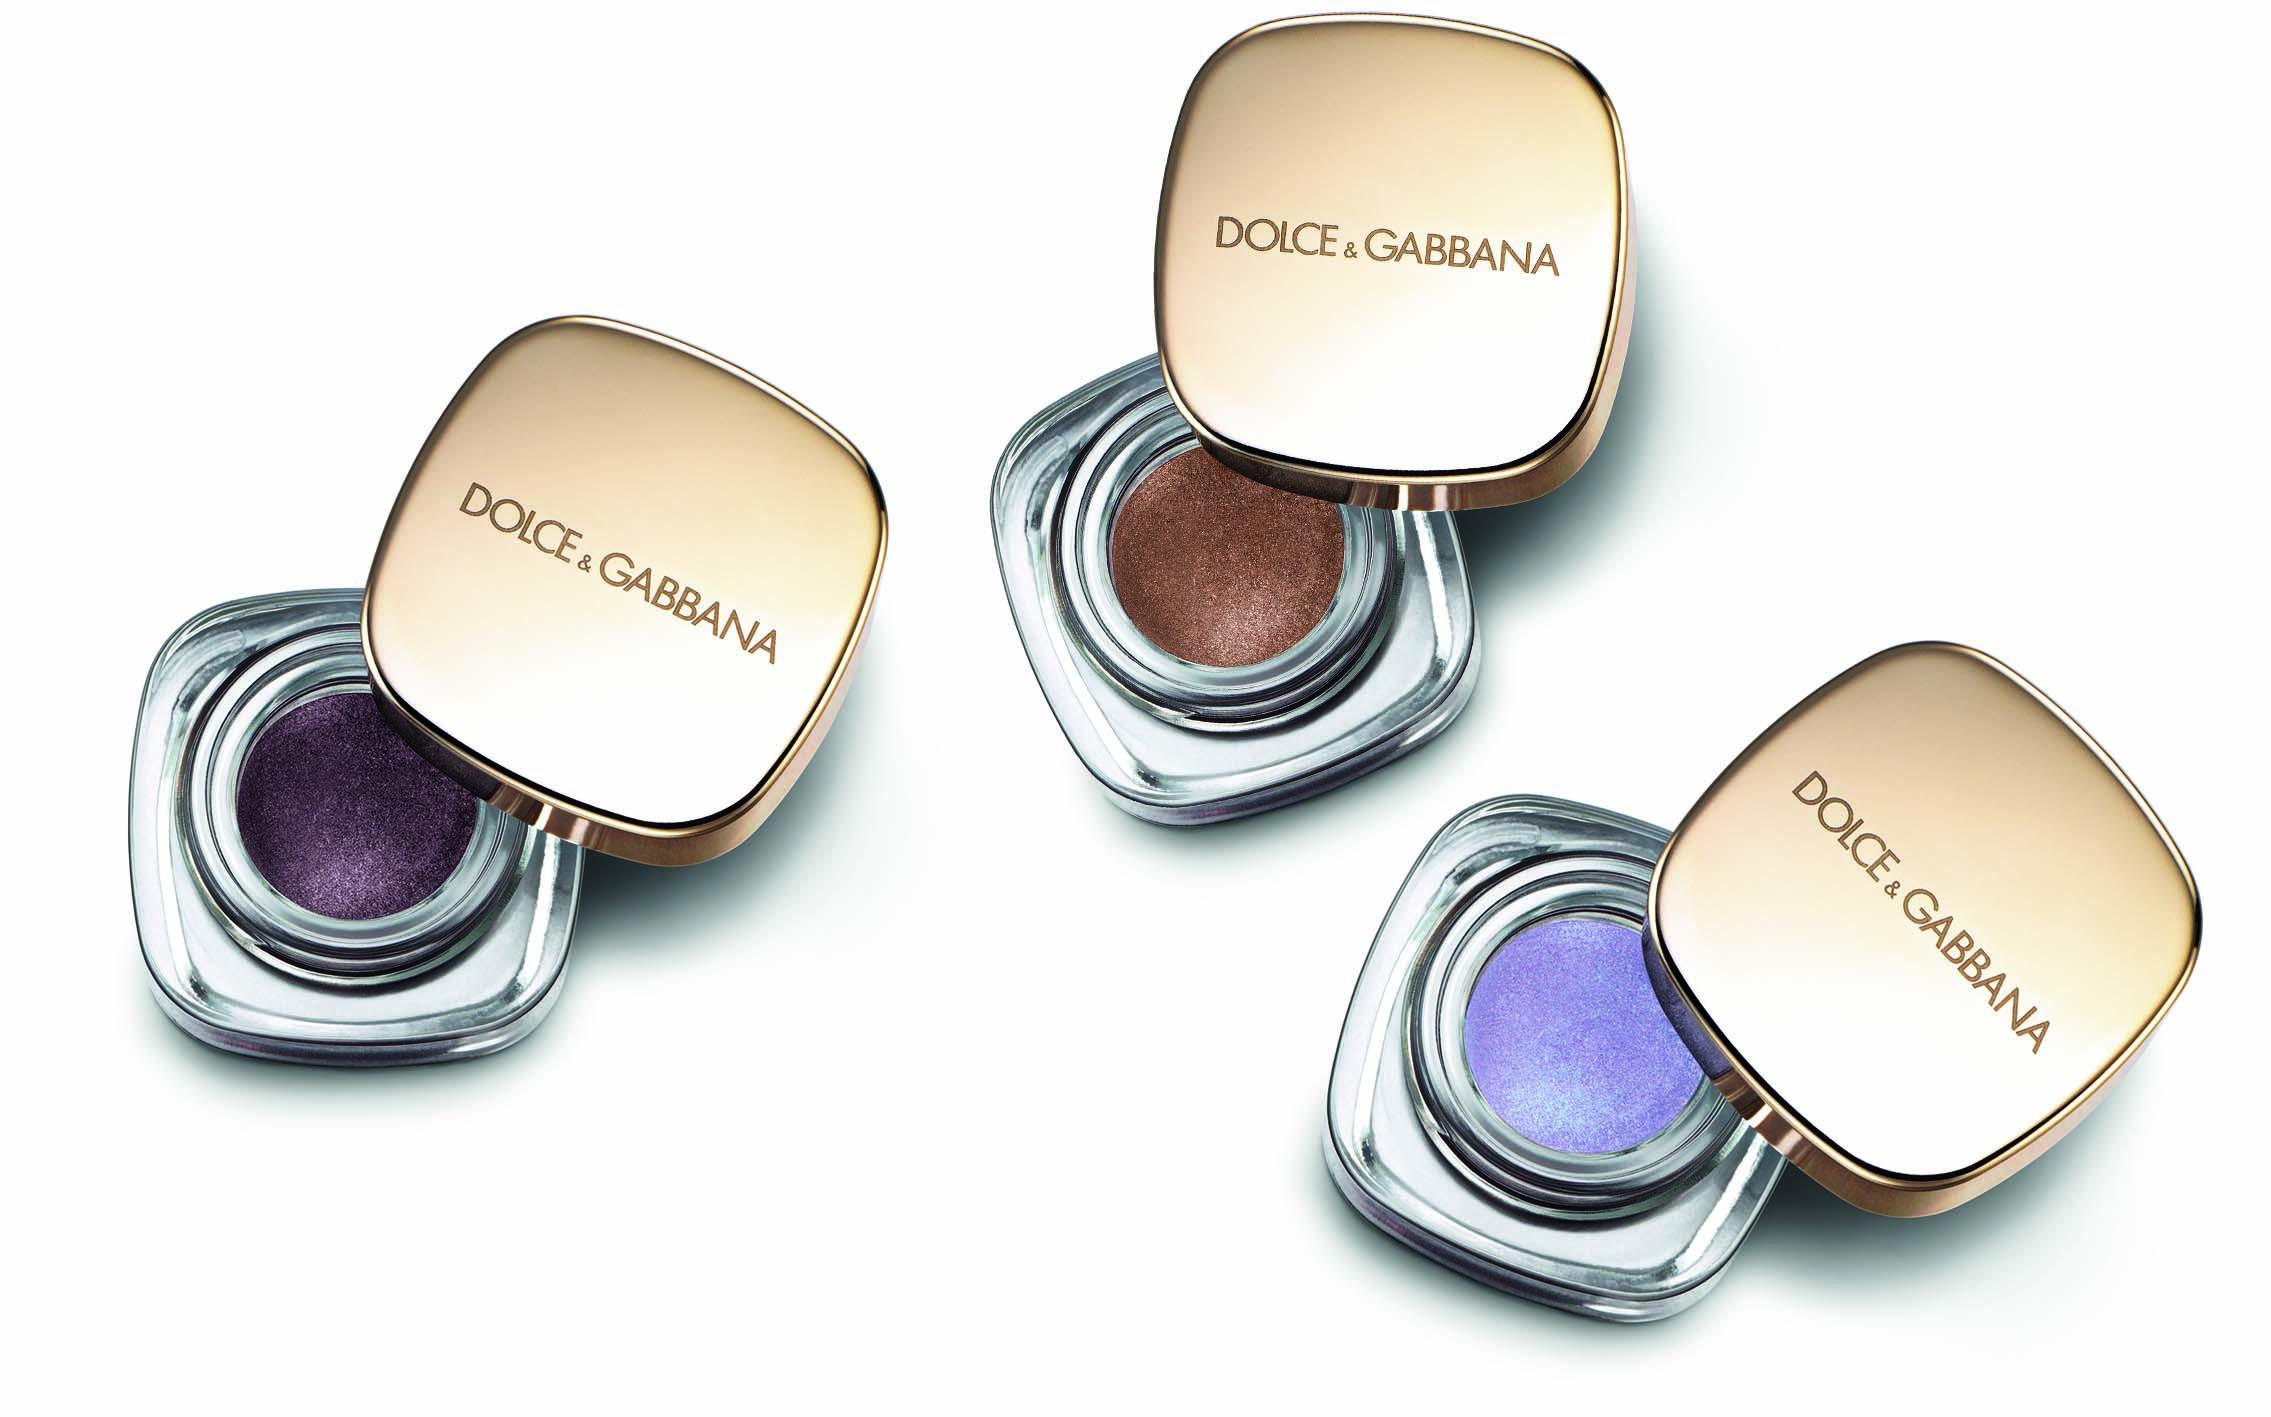 Dolce & Gabbana Cream Eye Colour (PVPR 31 €)